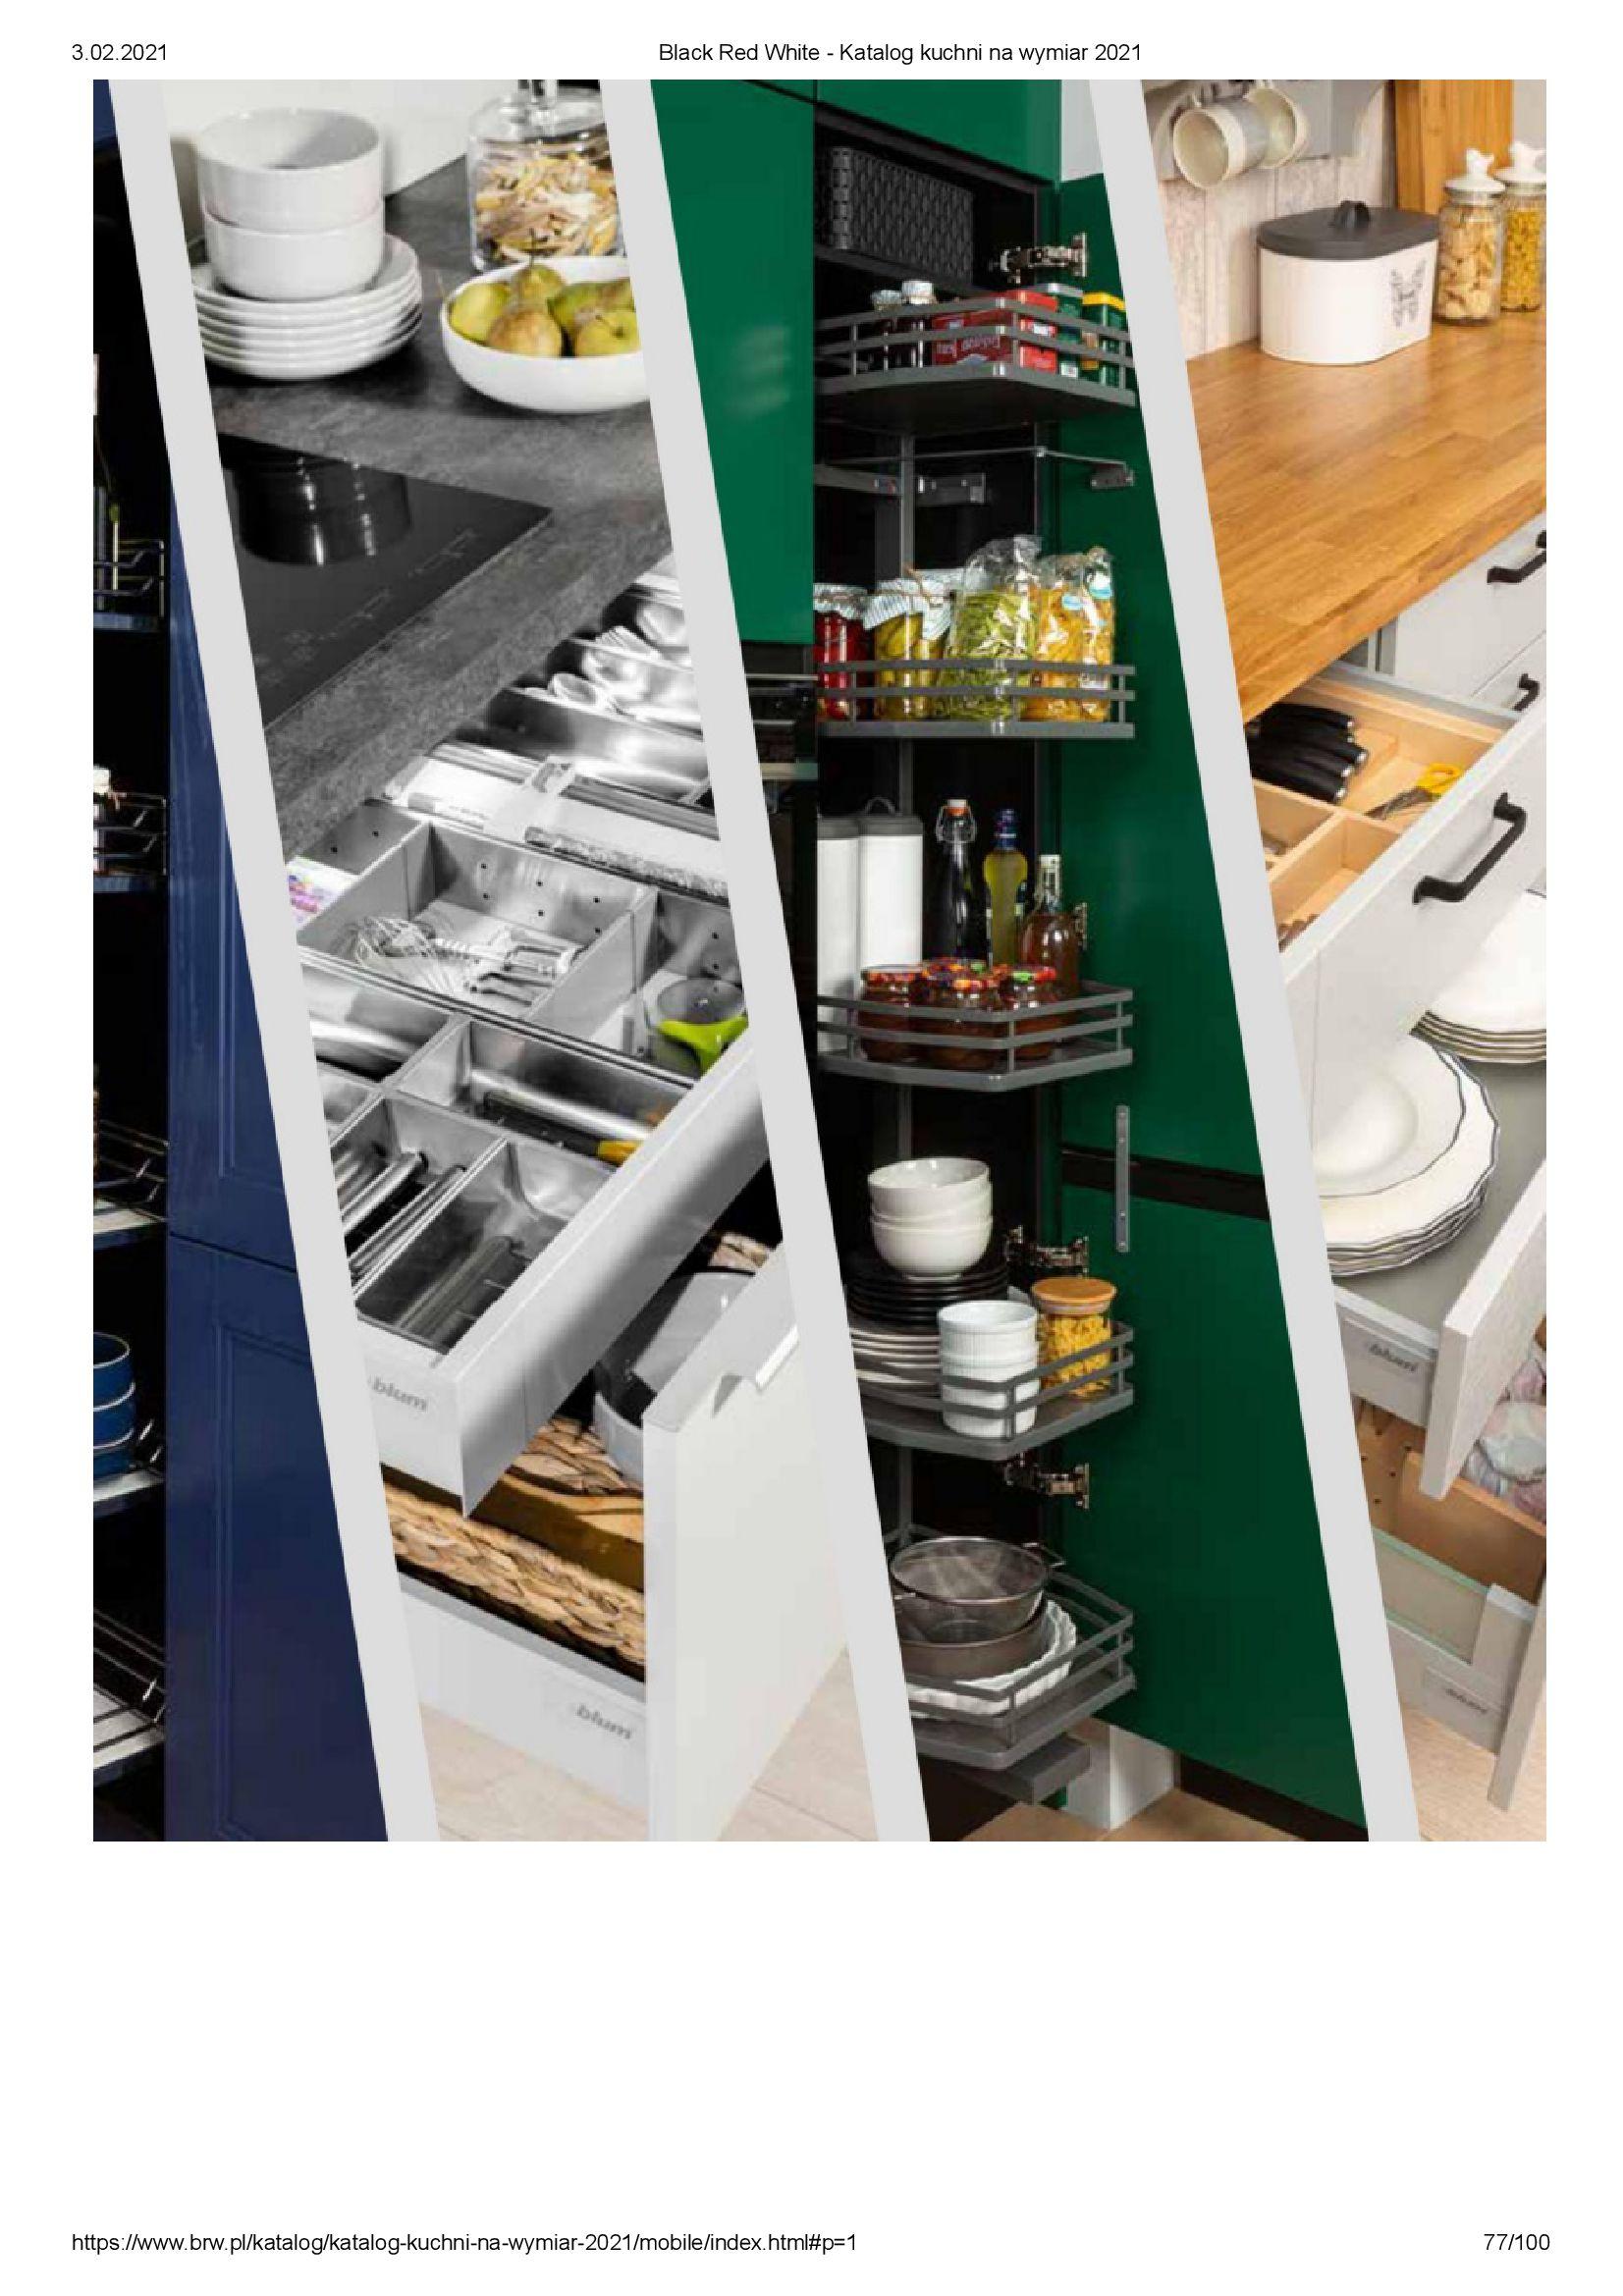 Gazetka Black Red White: Katalog - Kuchnie na wymiar Senso Kitchens 2021 2021-01-01 page-77